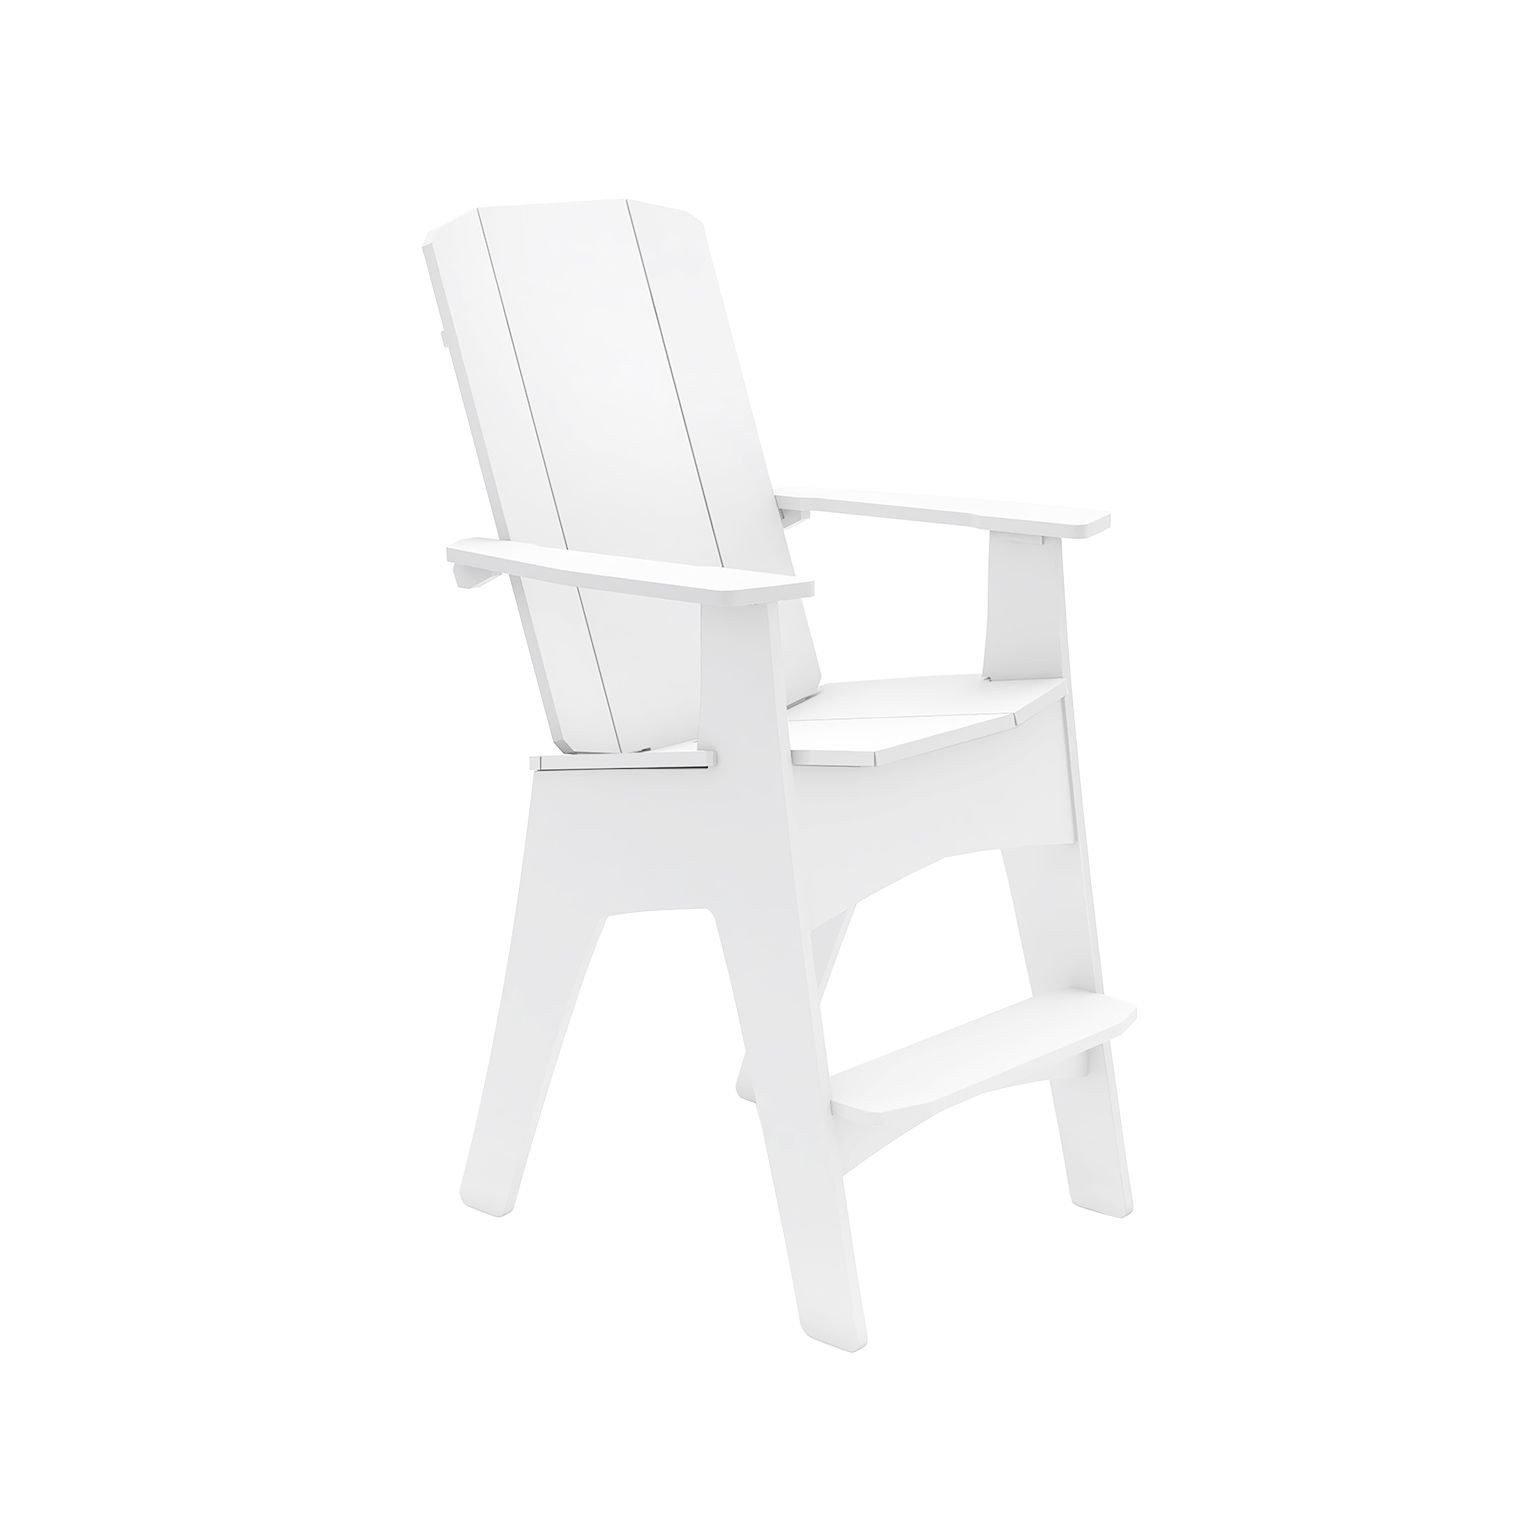 mainstay-adirondack-tall-chair